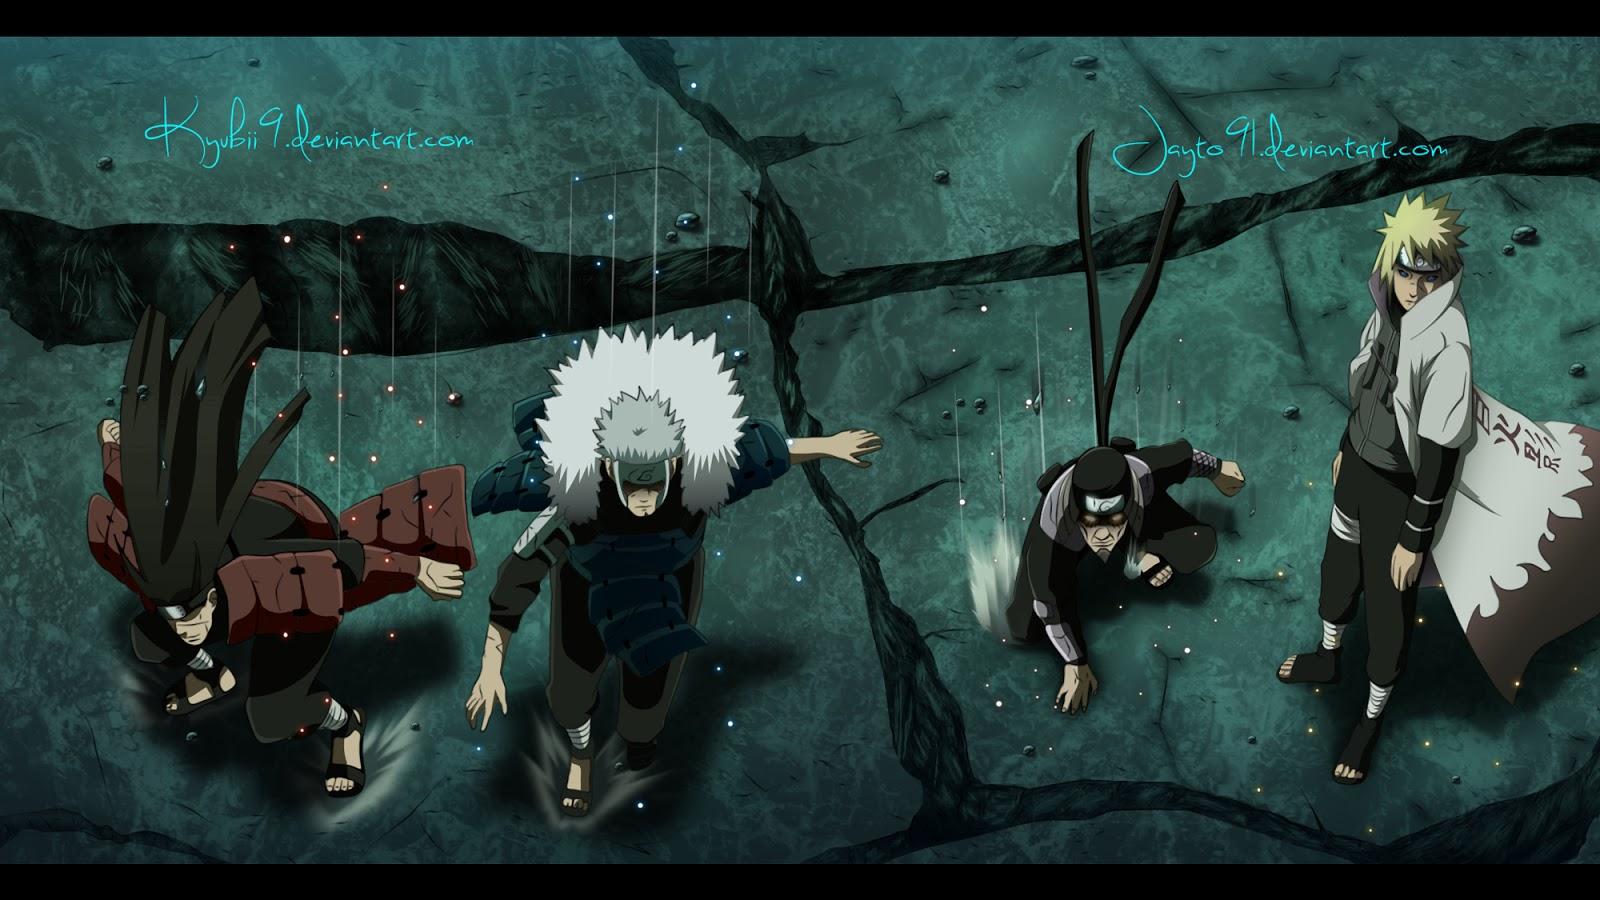 Minato Namikaze Male Deviant Art Anime HD Wallpaper Backgrounds b42 1600x900